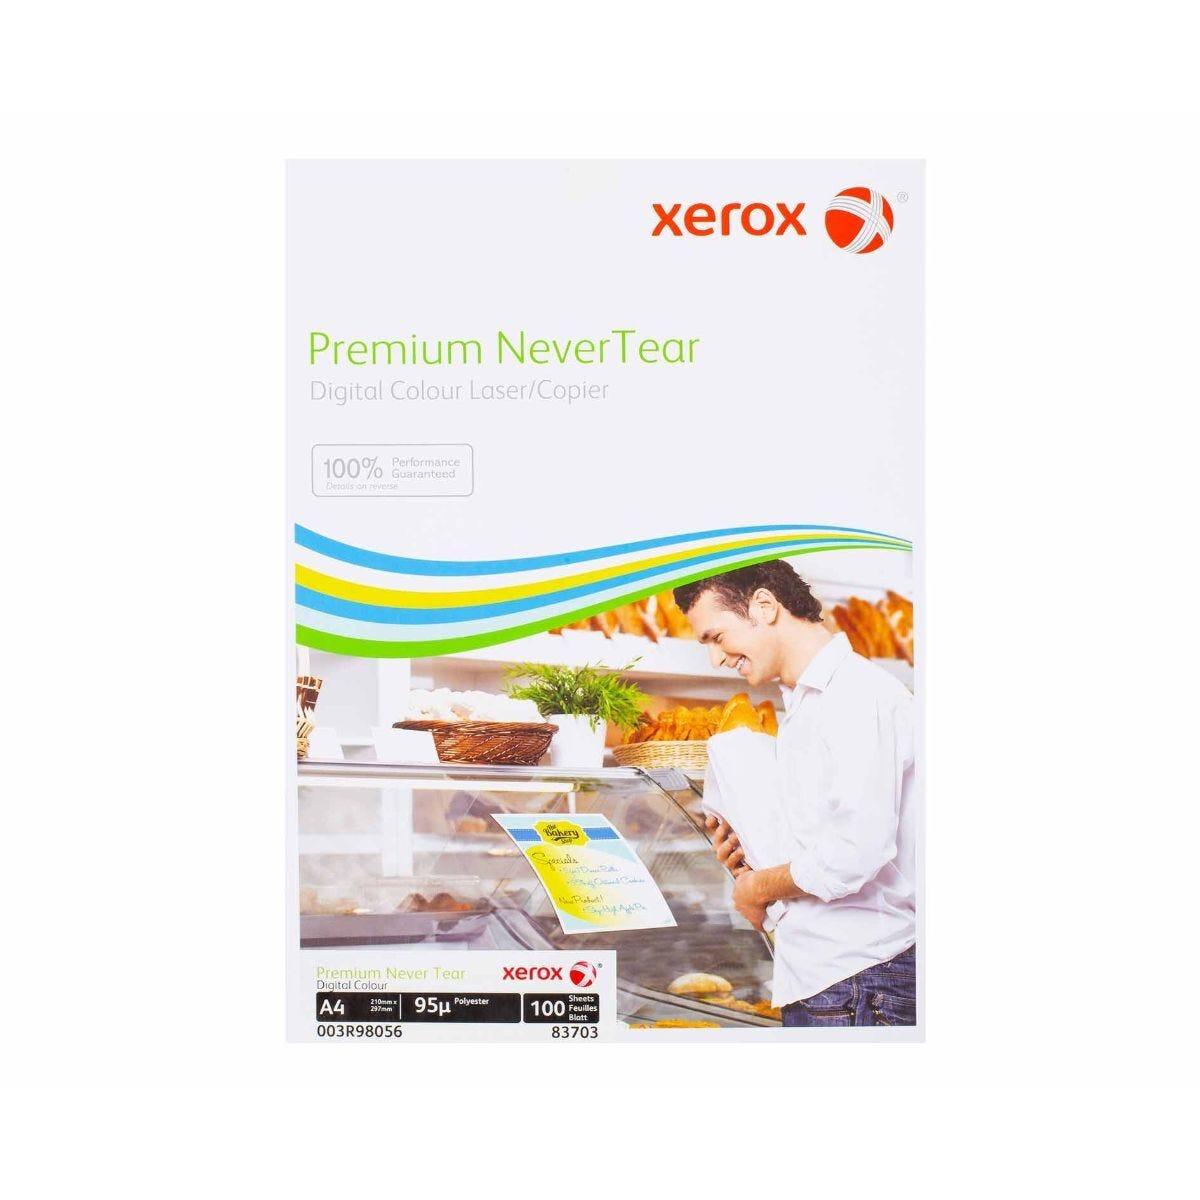 Xerox Premium NeverTear Paper 95mic A4 100 Sheets